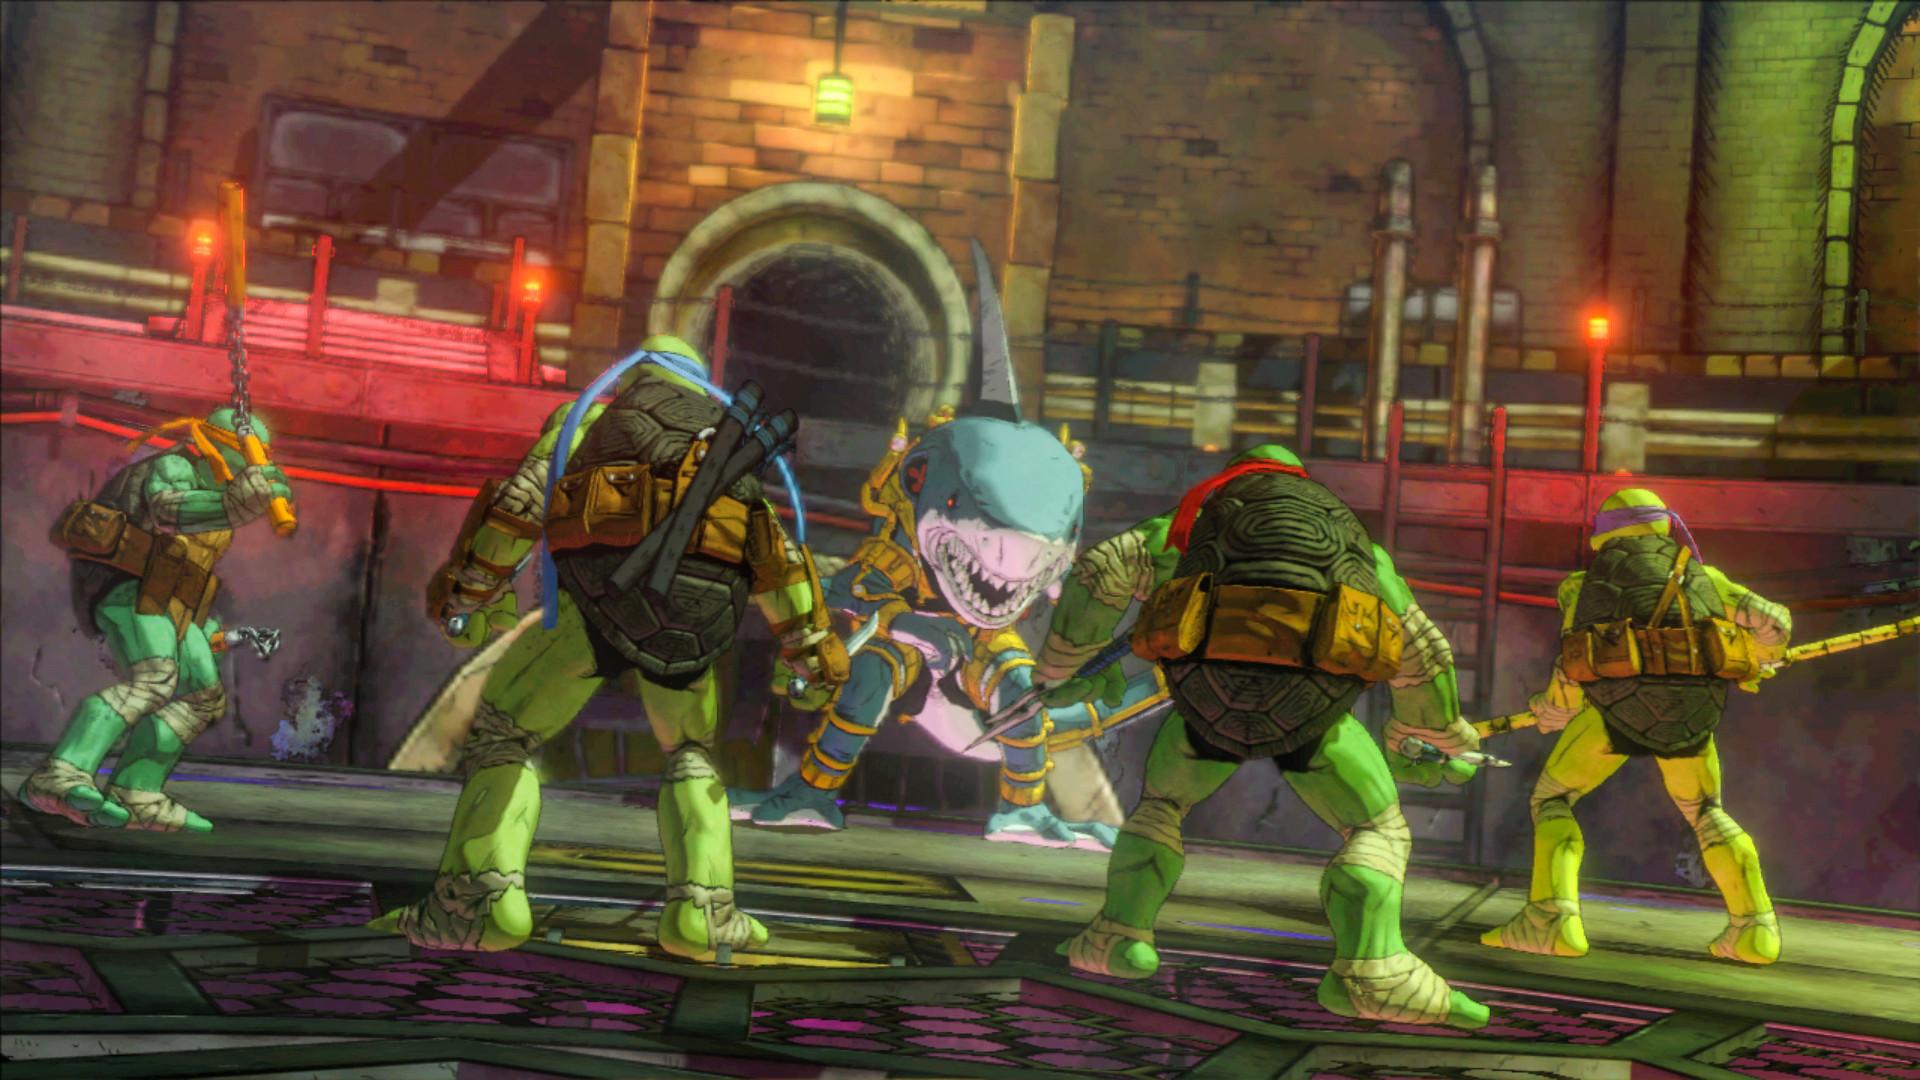 Teenage Mutant Ninja Turtles: Mutants in Manhattan Screenshot 2